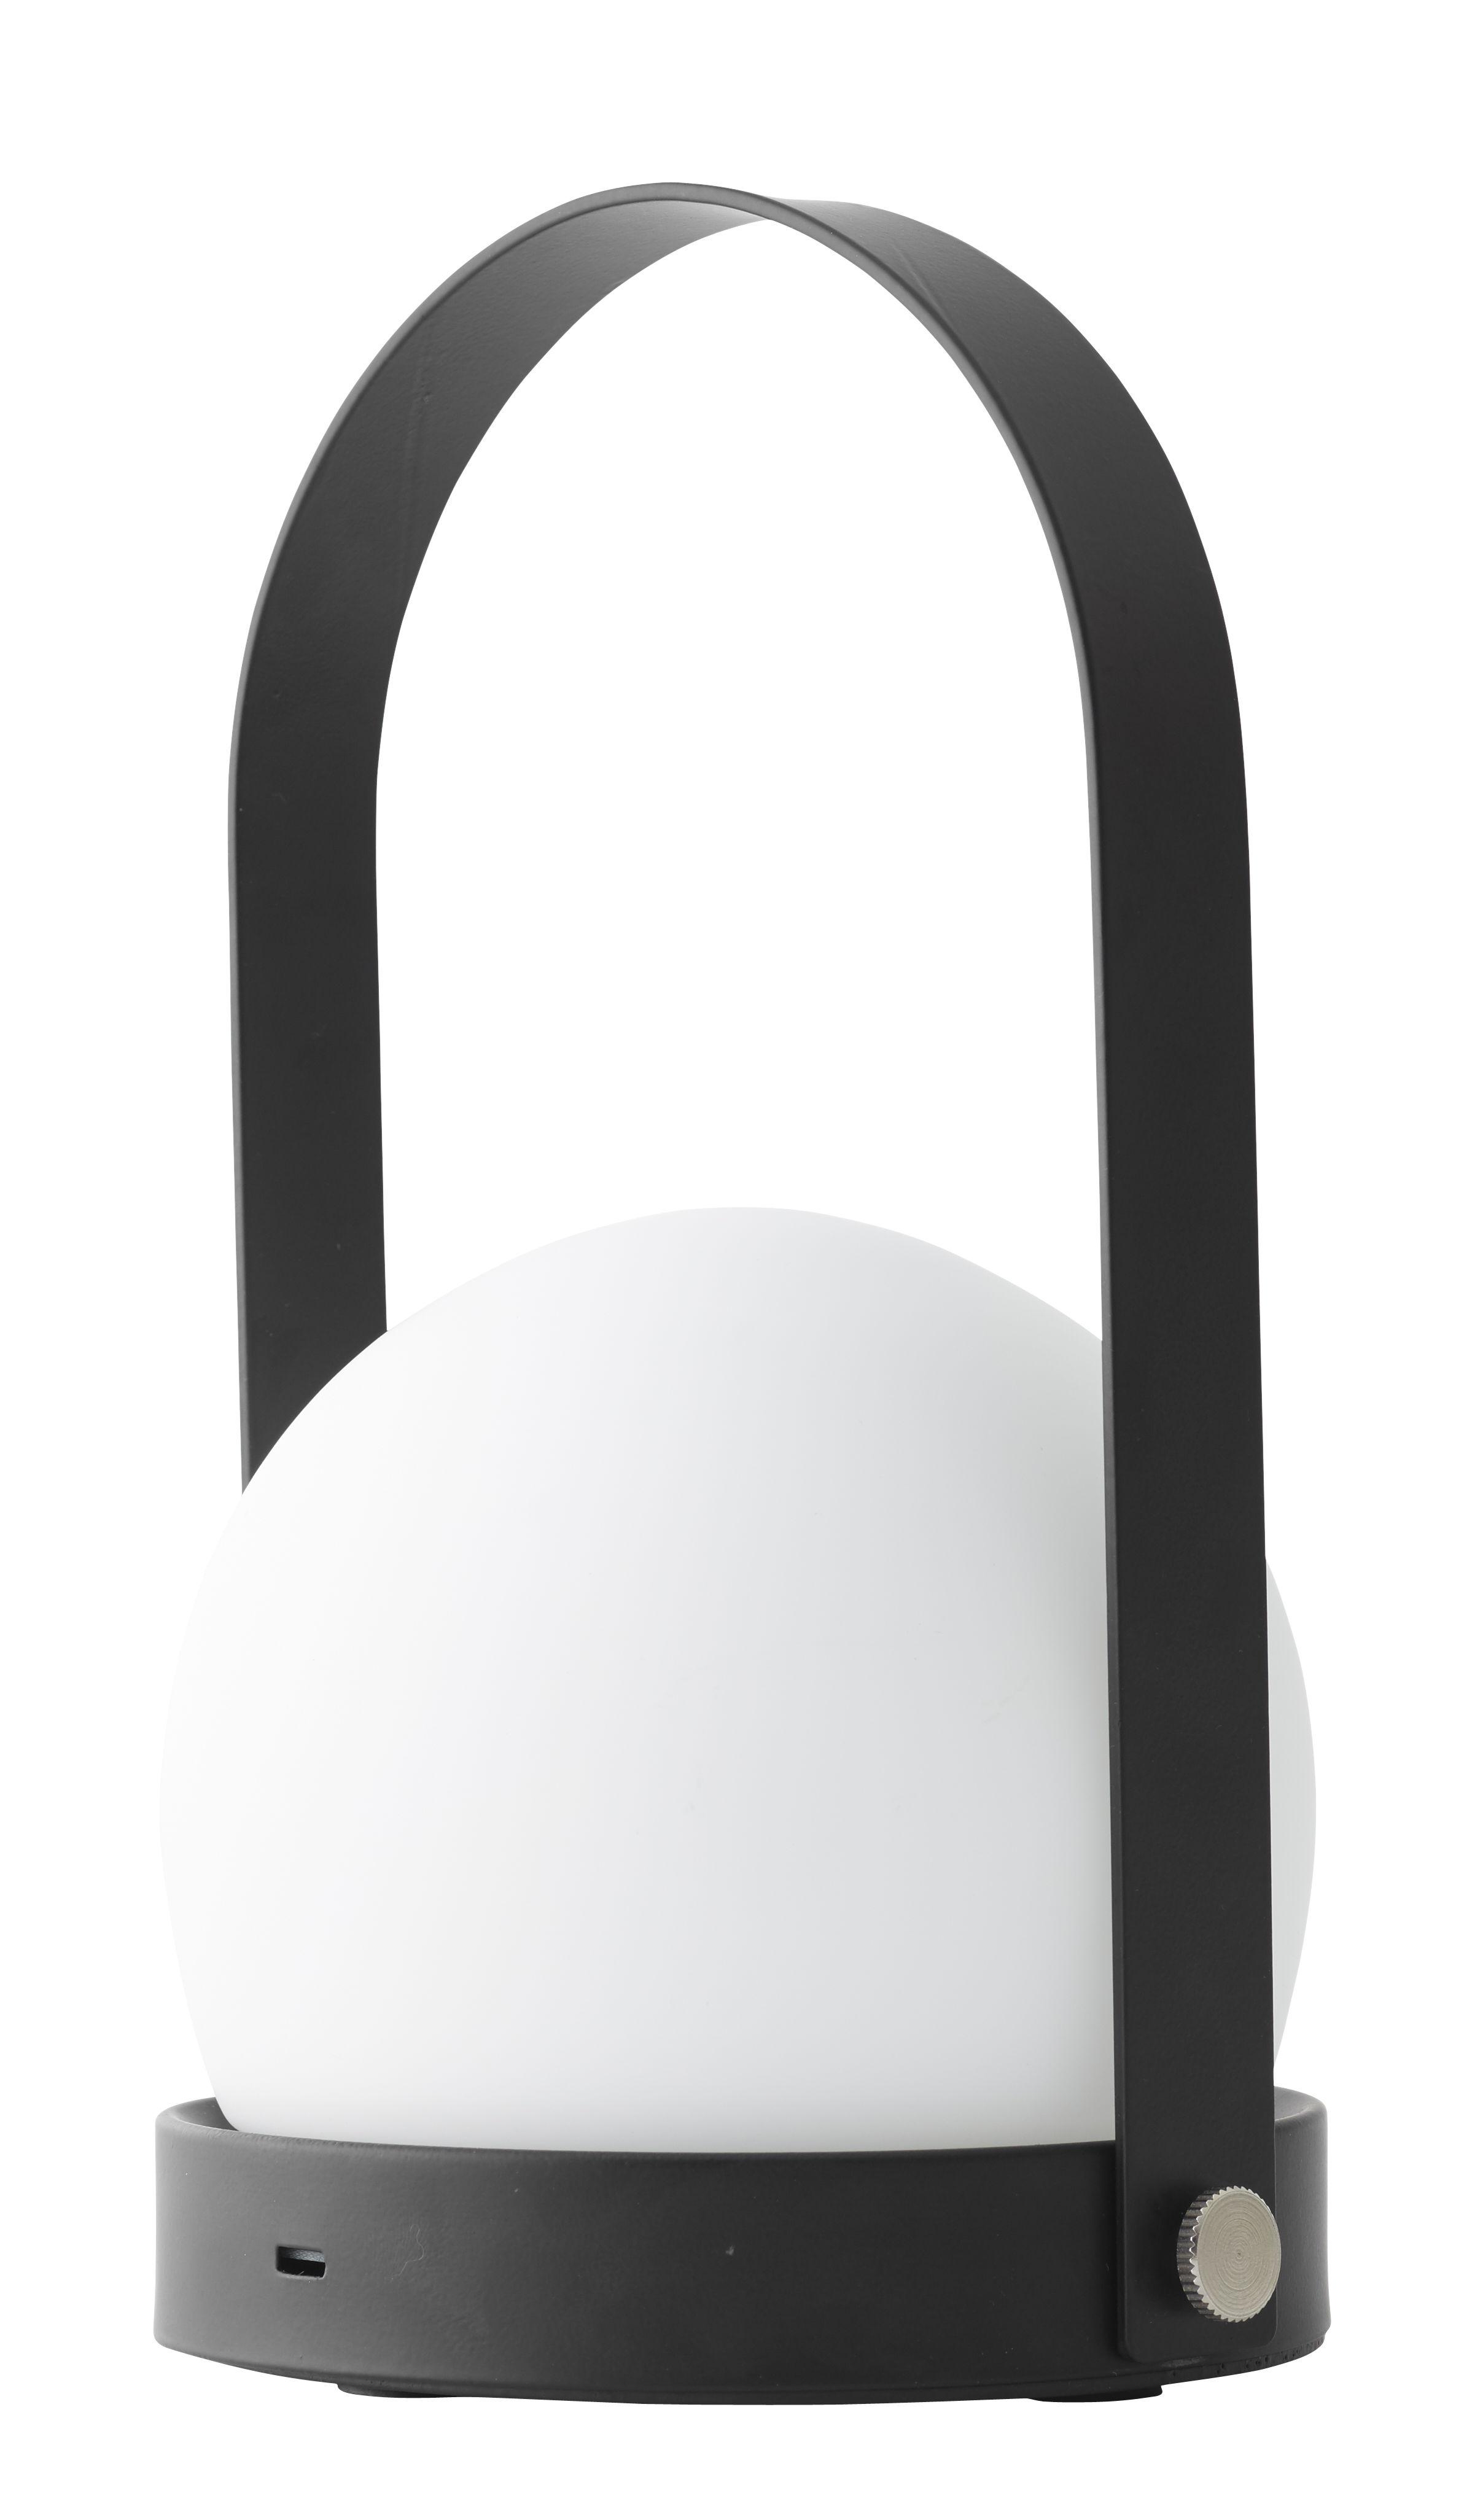 carrie led lampe ohne kabel mit usb ladeport metall glas schwarz wei by menu made. Black Bedroom Furniture Sets. Home Design Ideas